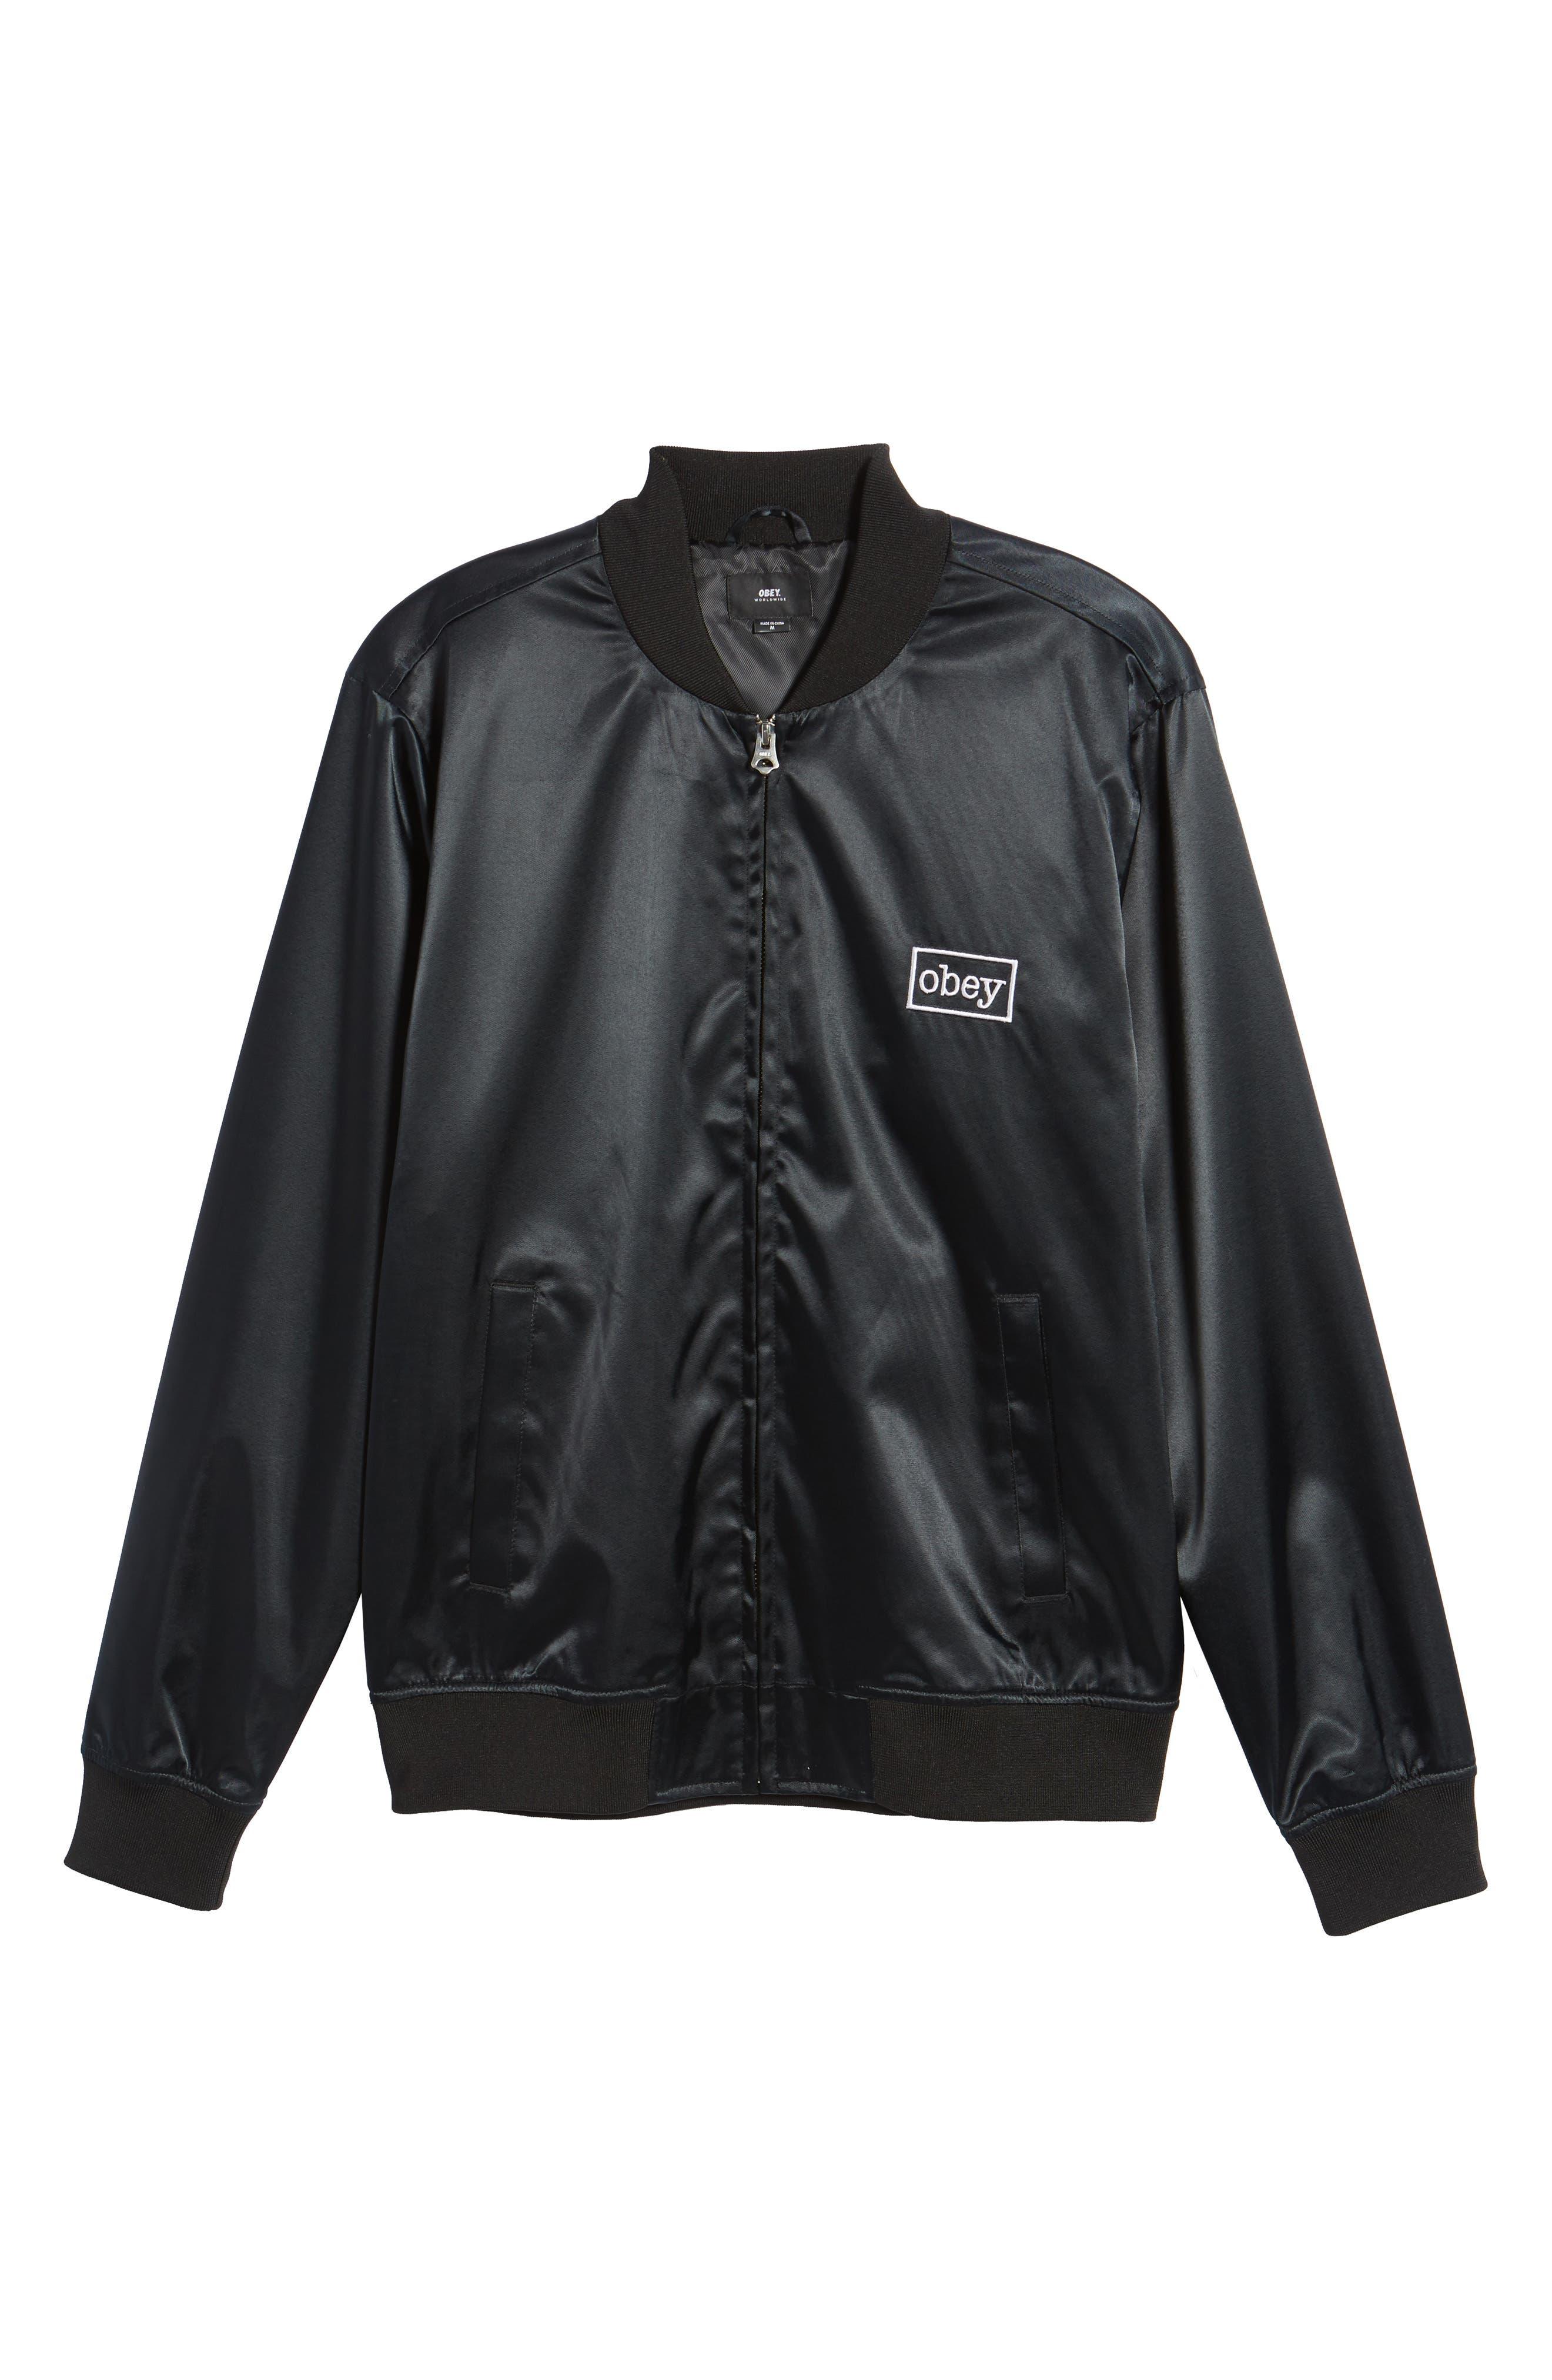 Band Bomber Jacket,                             Alternate thumbnail 6, color,                             Black